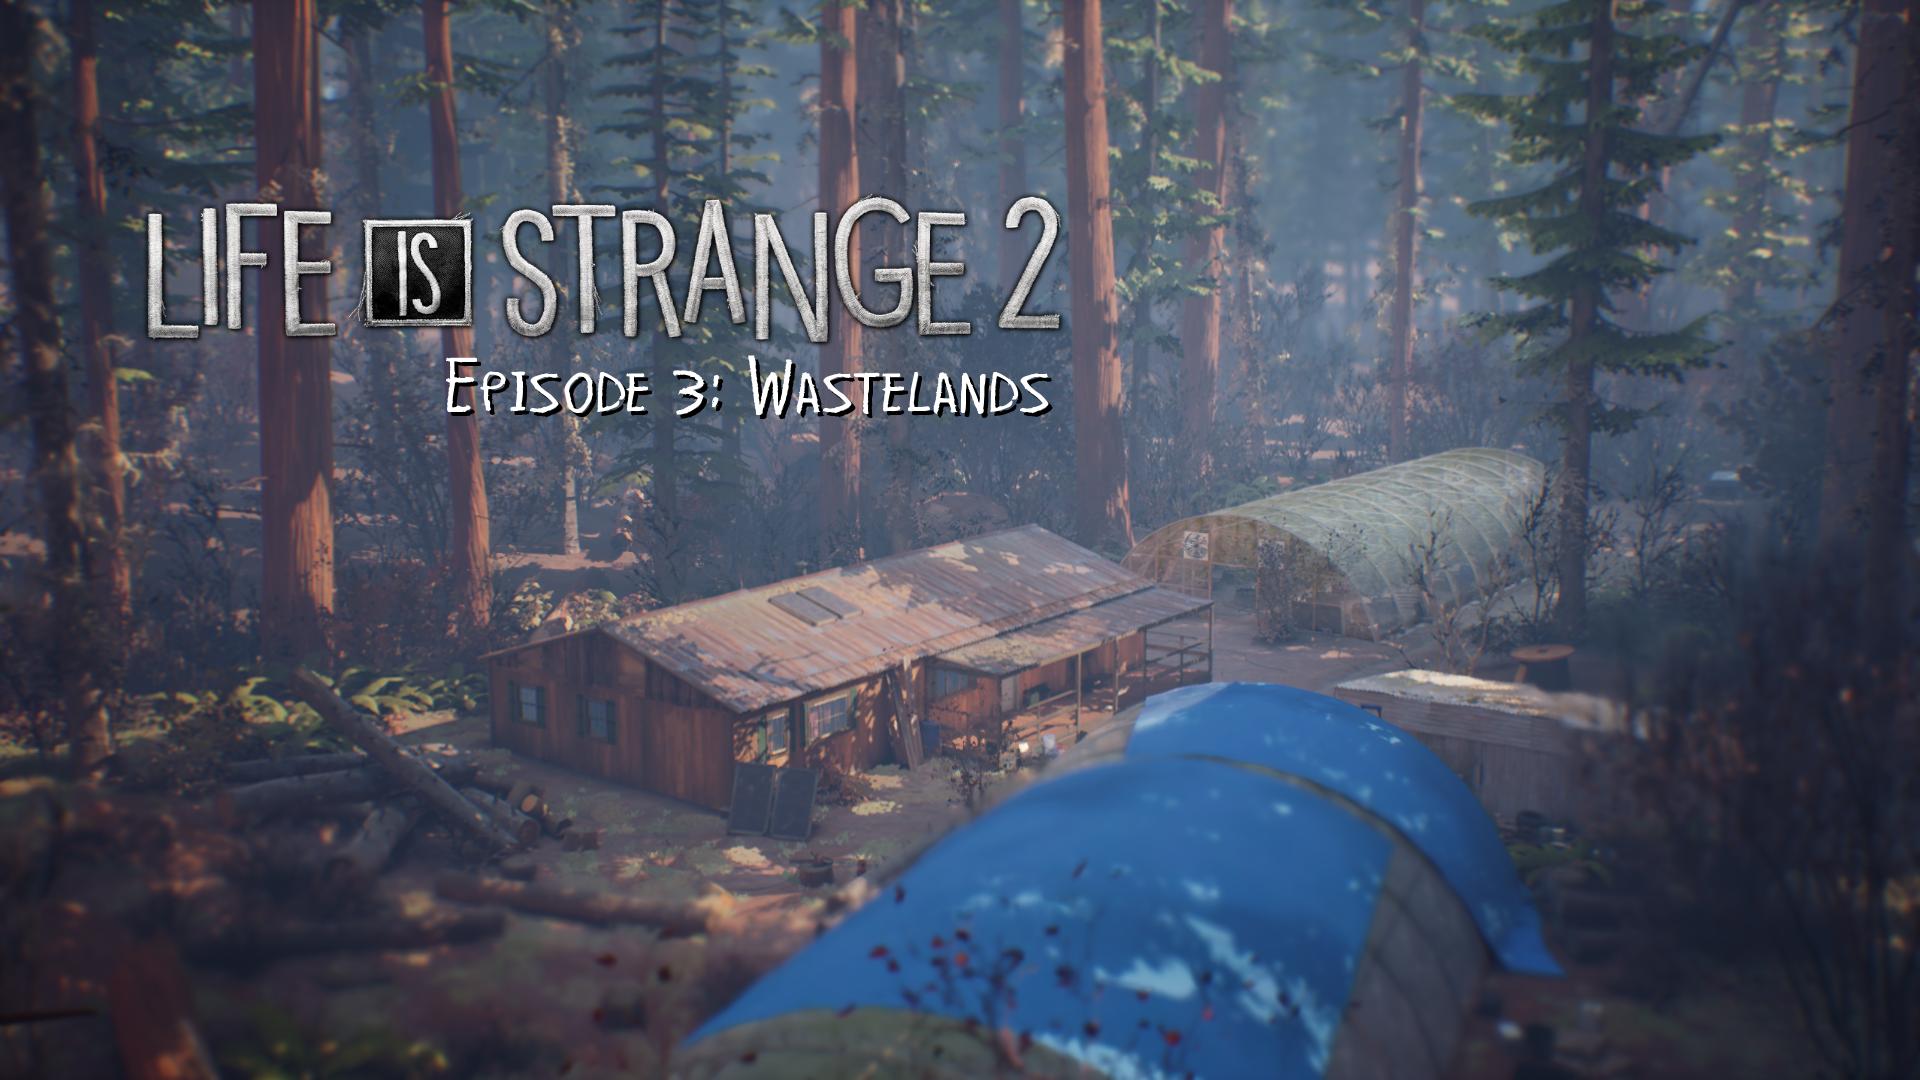 Episode 3: Wastelands | Life is Strange Wiki | FANDOM powered by Wikia